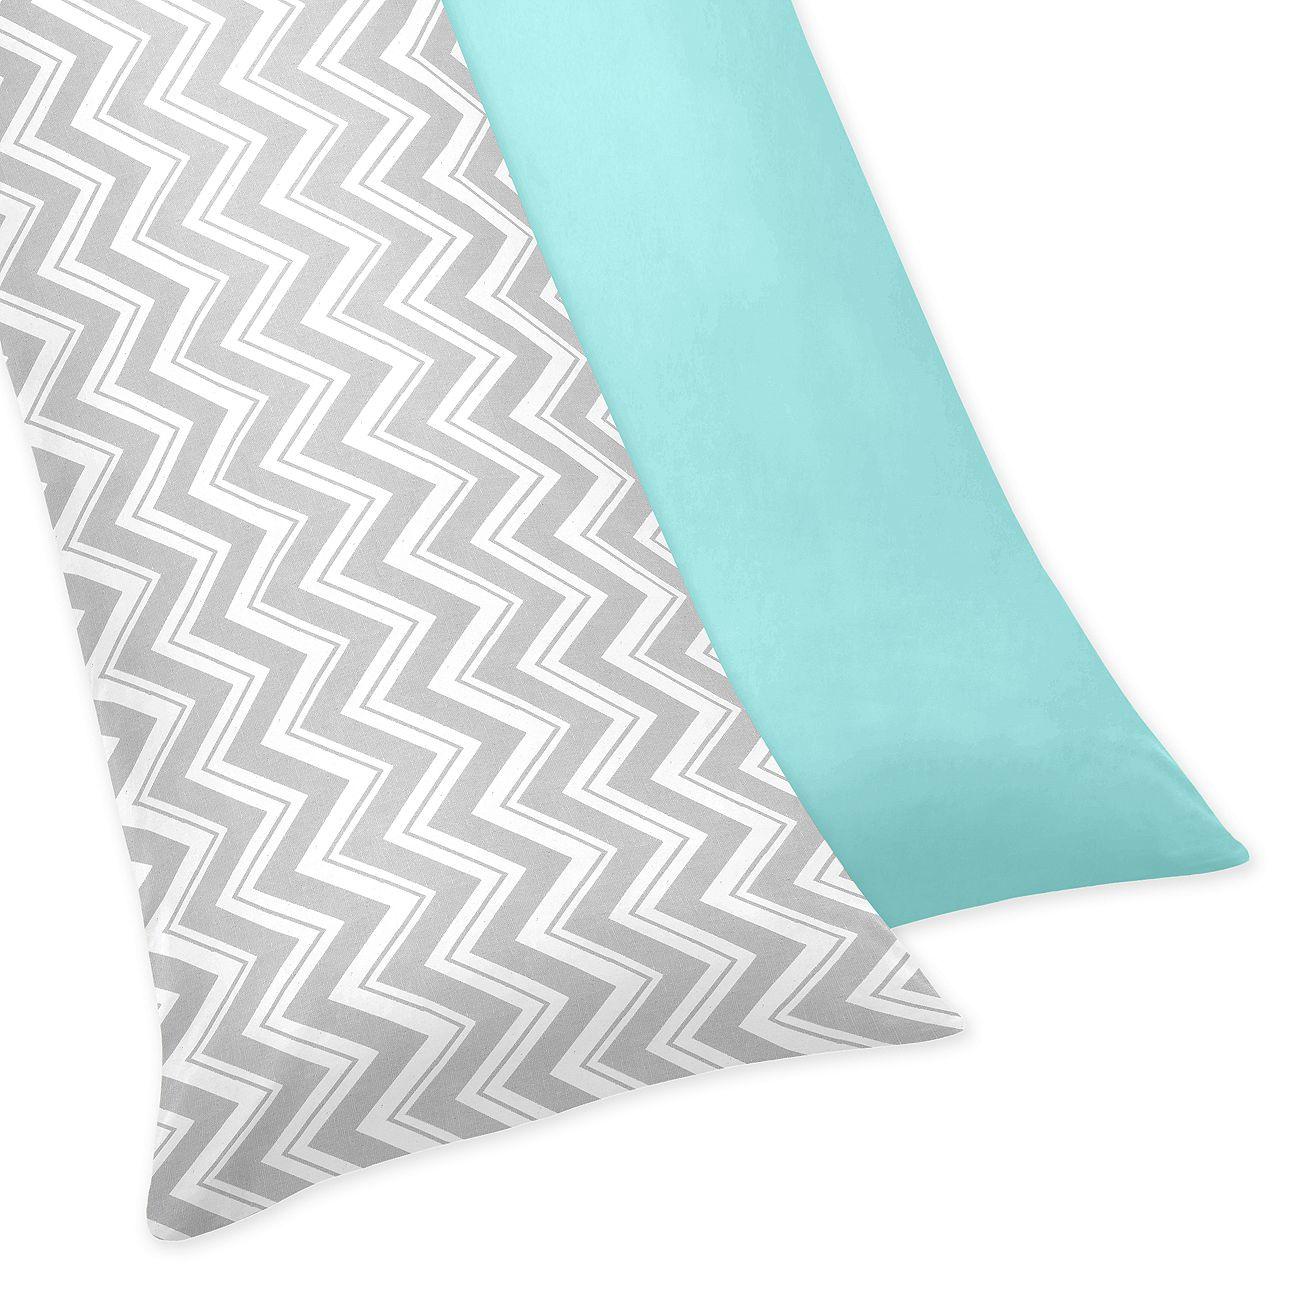 Sweet Jojo Designs Turquoise Grey Chevron Print Reversible Pillowcase Overstock 7619114